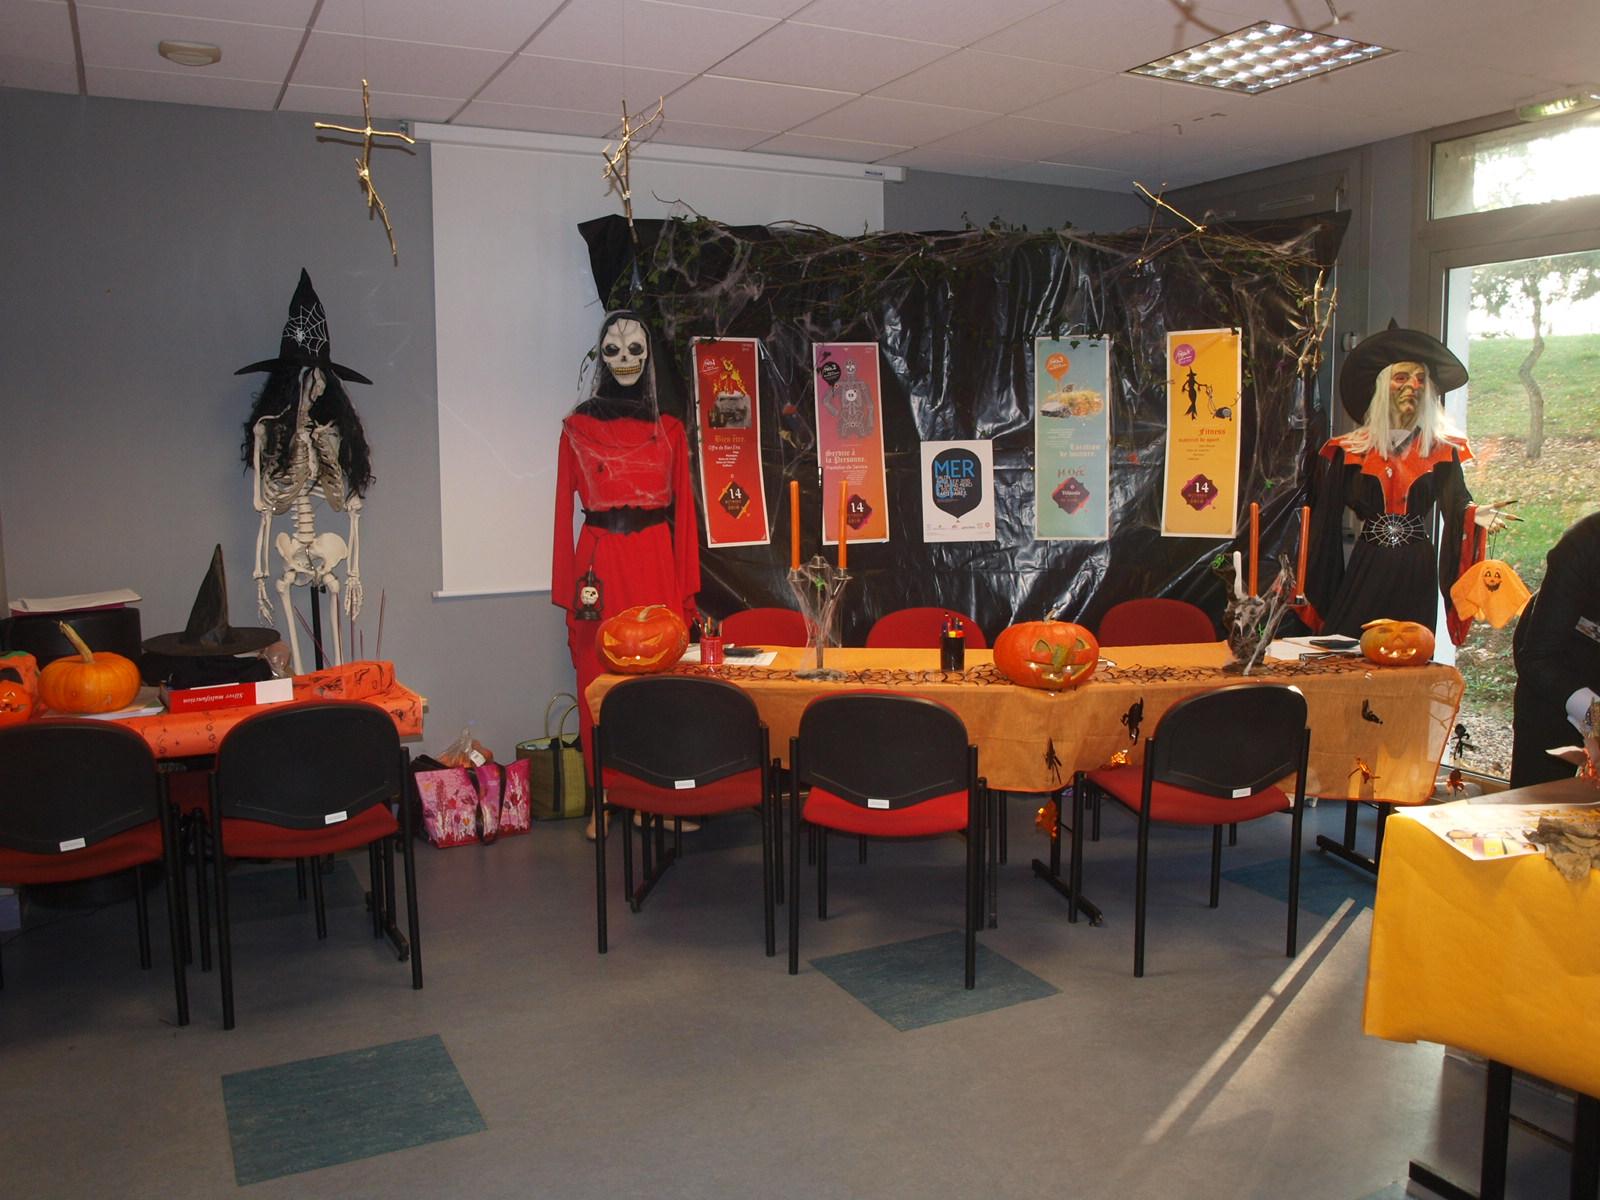 D coration salon halloween d co sphair - Decoration salon halloween ...